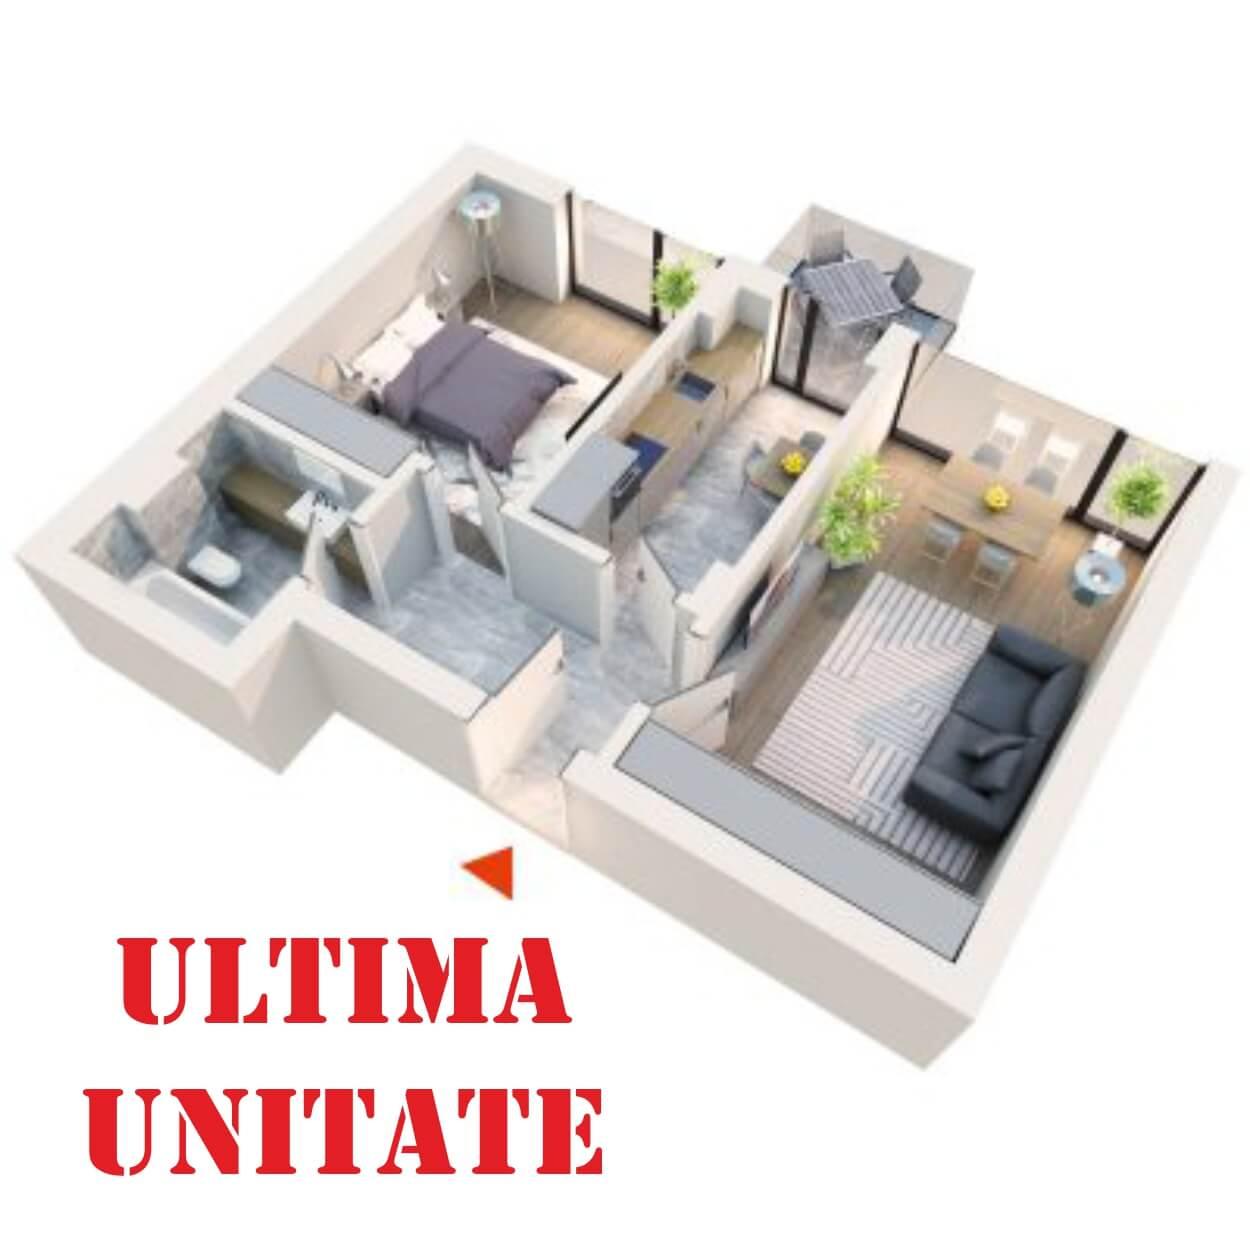 Apartament 2 camere tip 2B4 Balcon | Etaj 1-3 | Corp C1, C6 | Faza 2